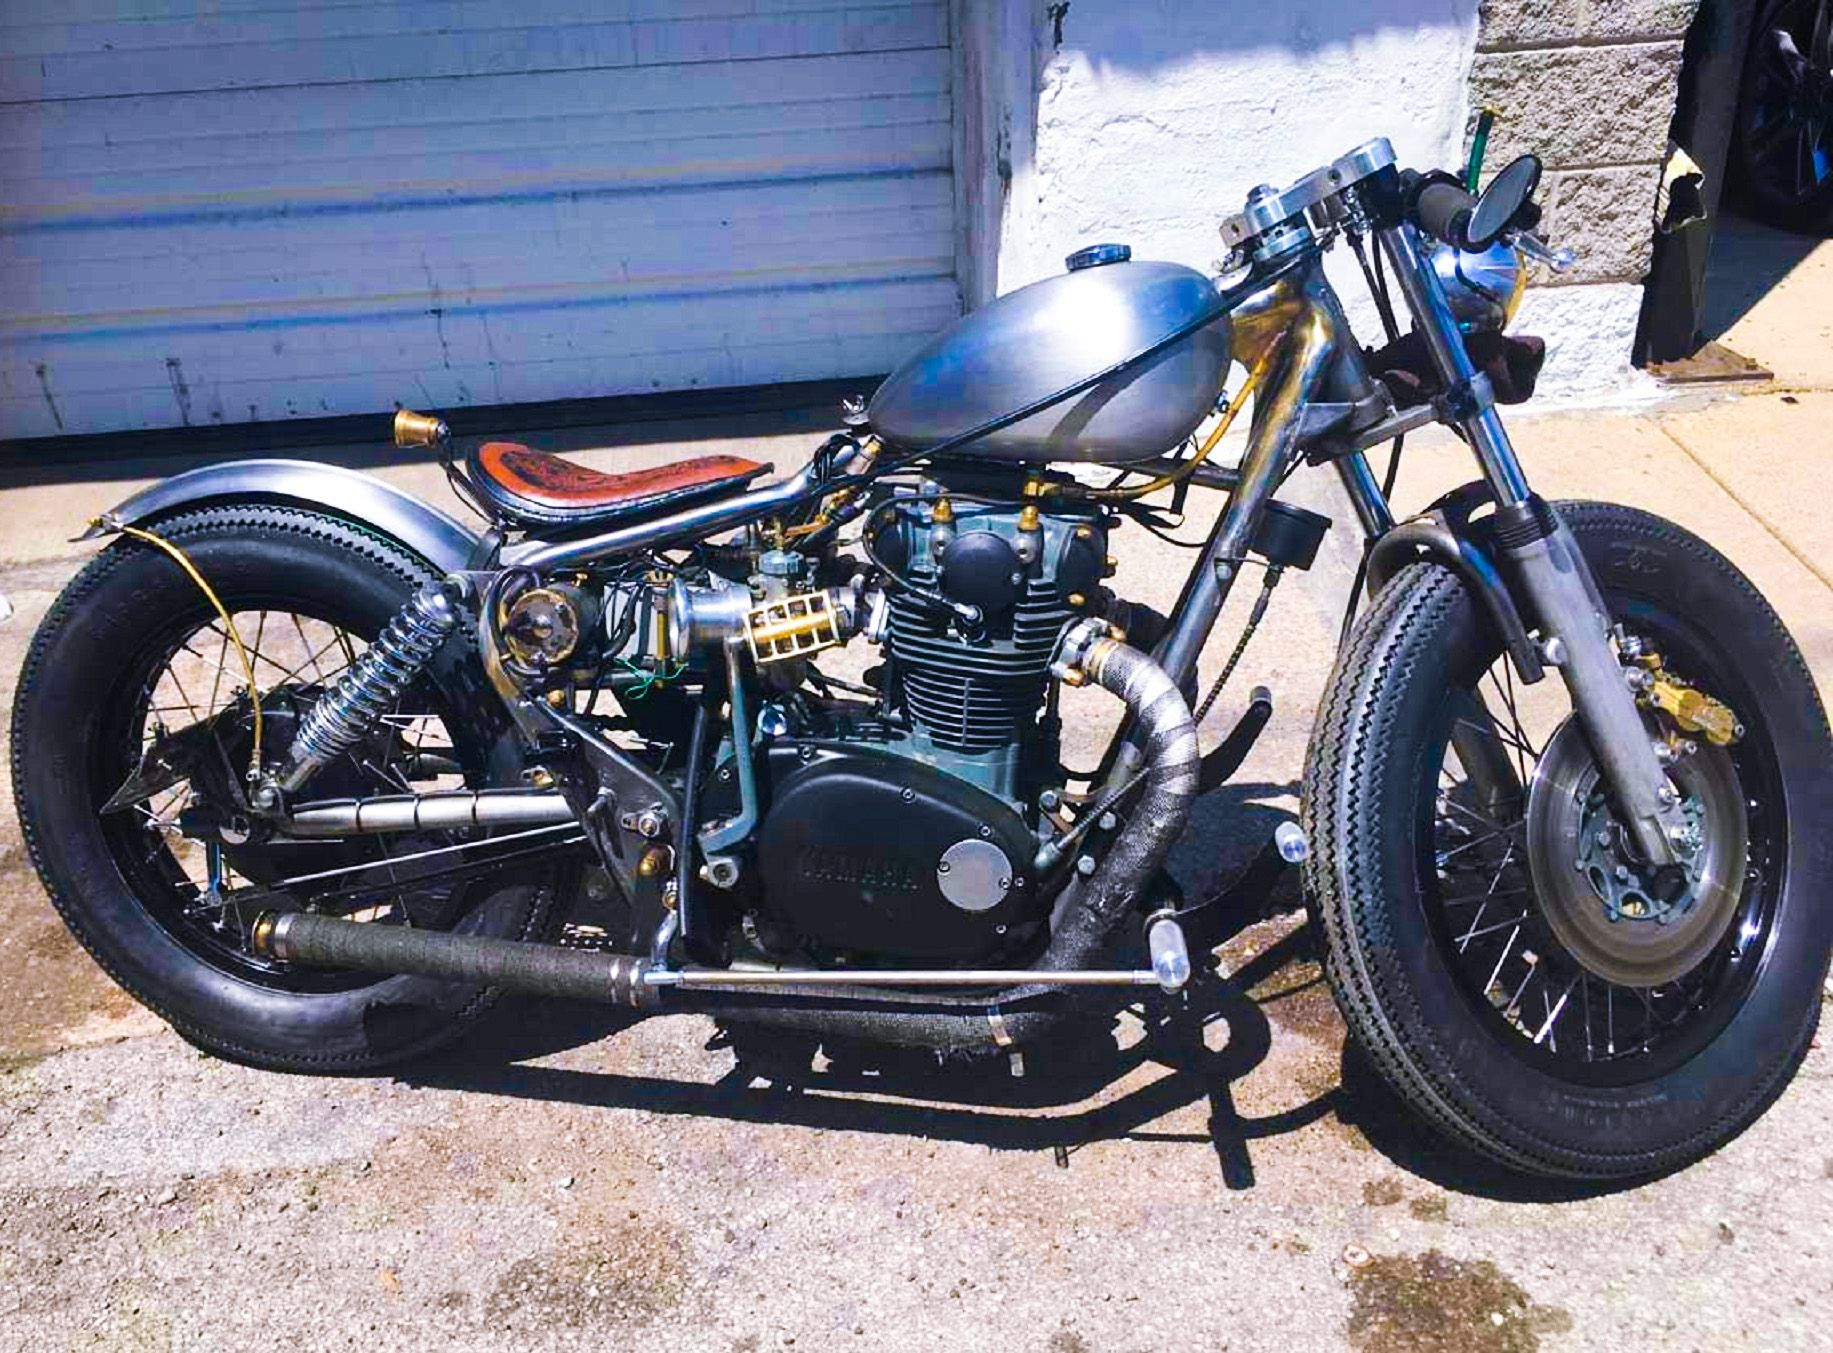 medium resolution of 1976 yamaha xs650 brat style bobber http xs650chopper com 2016